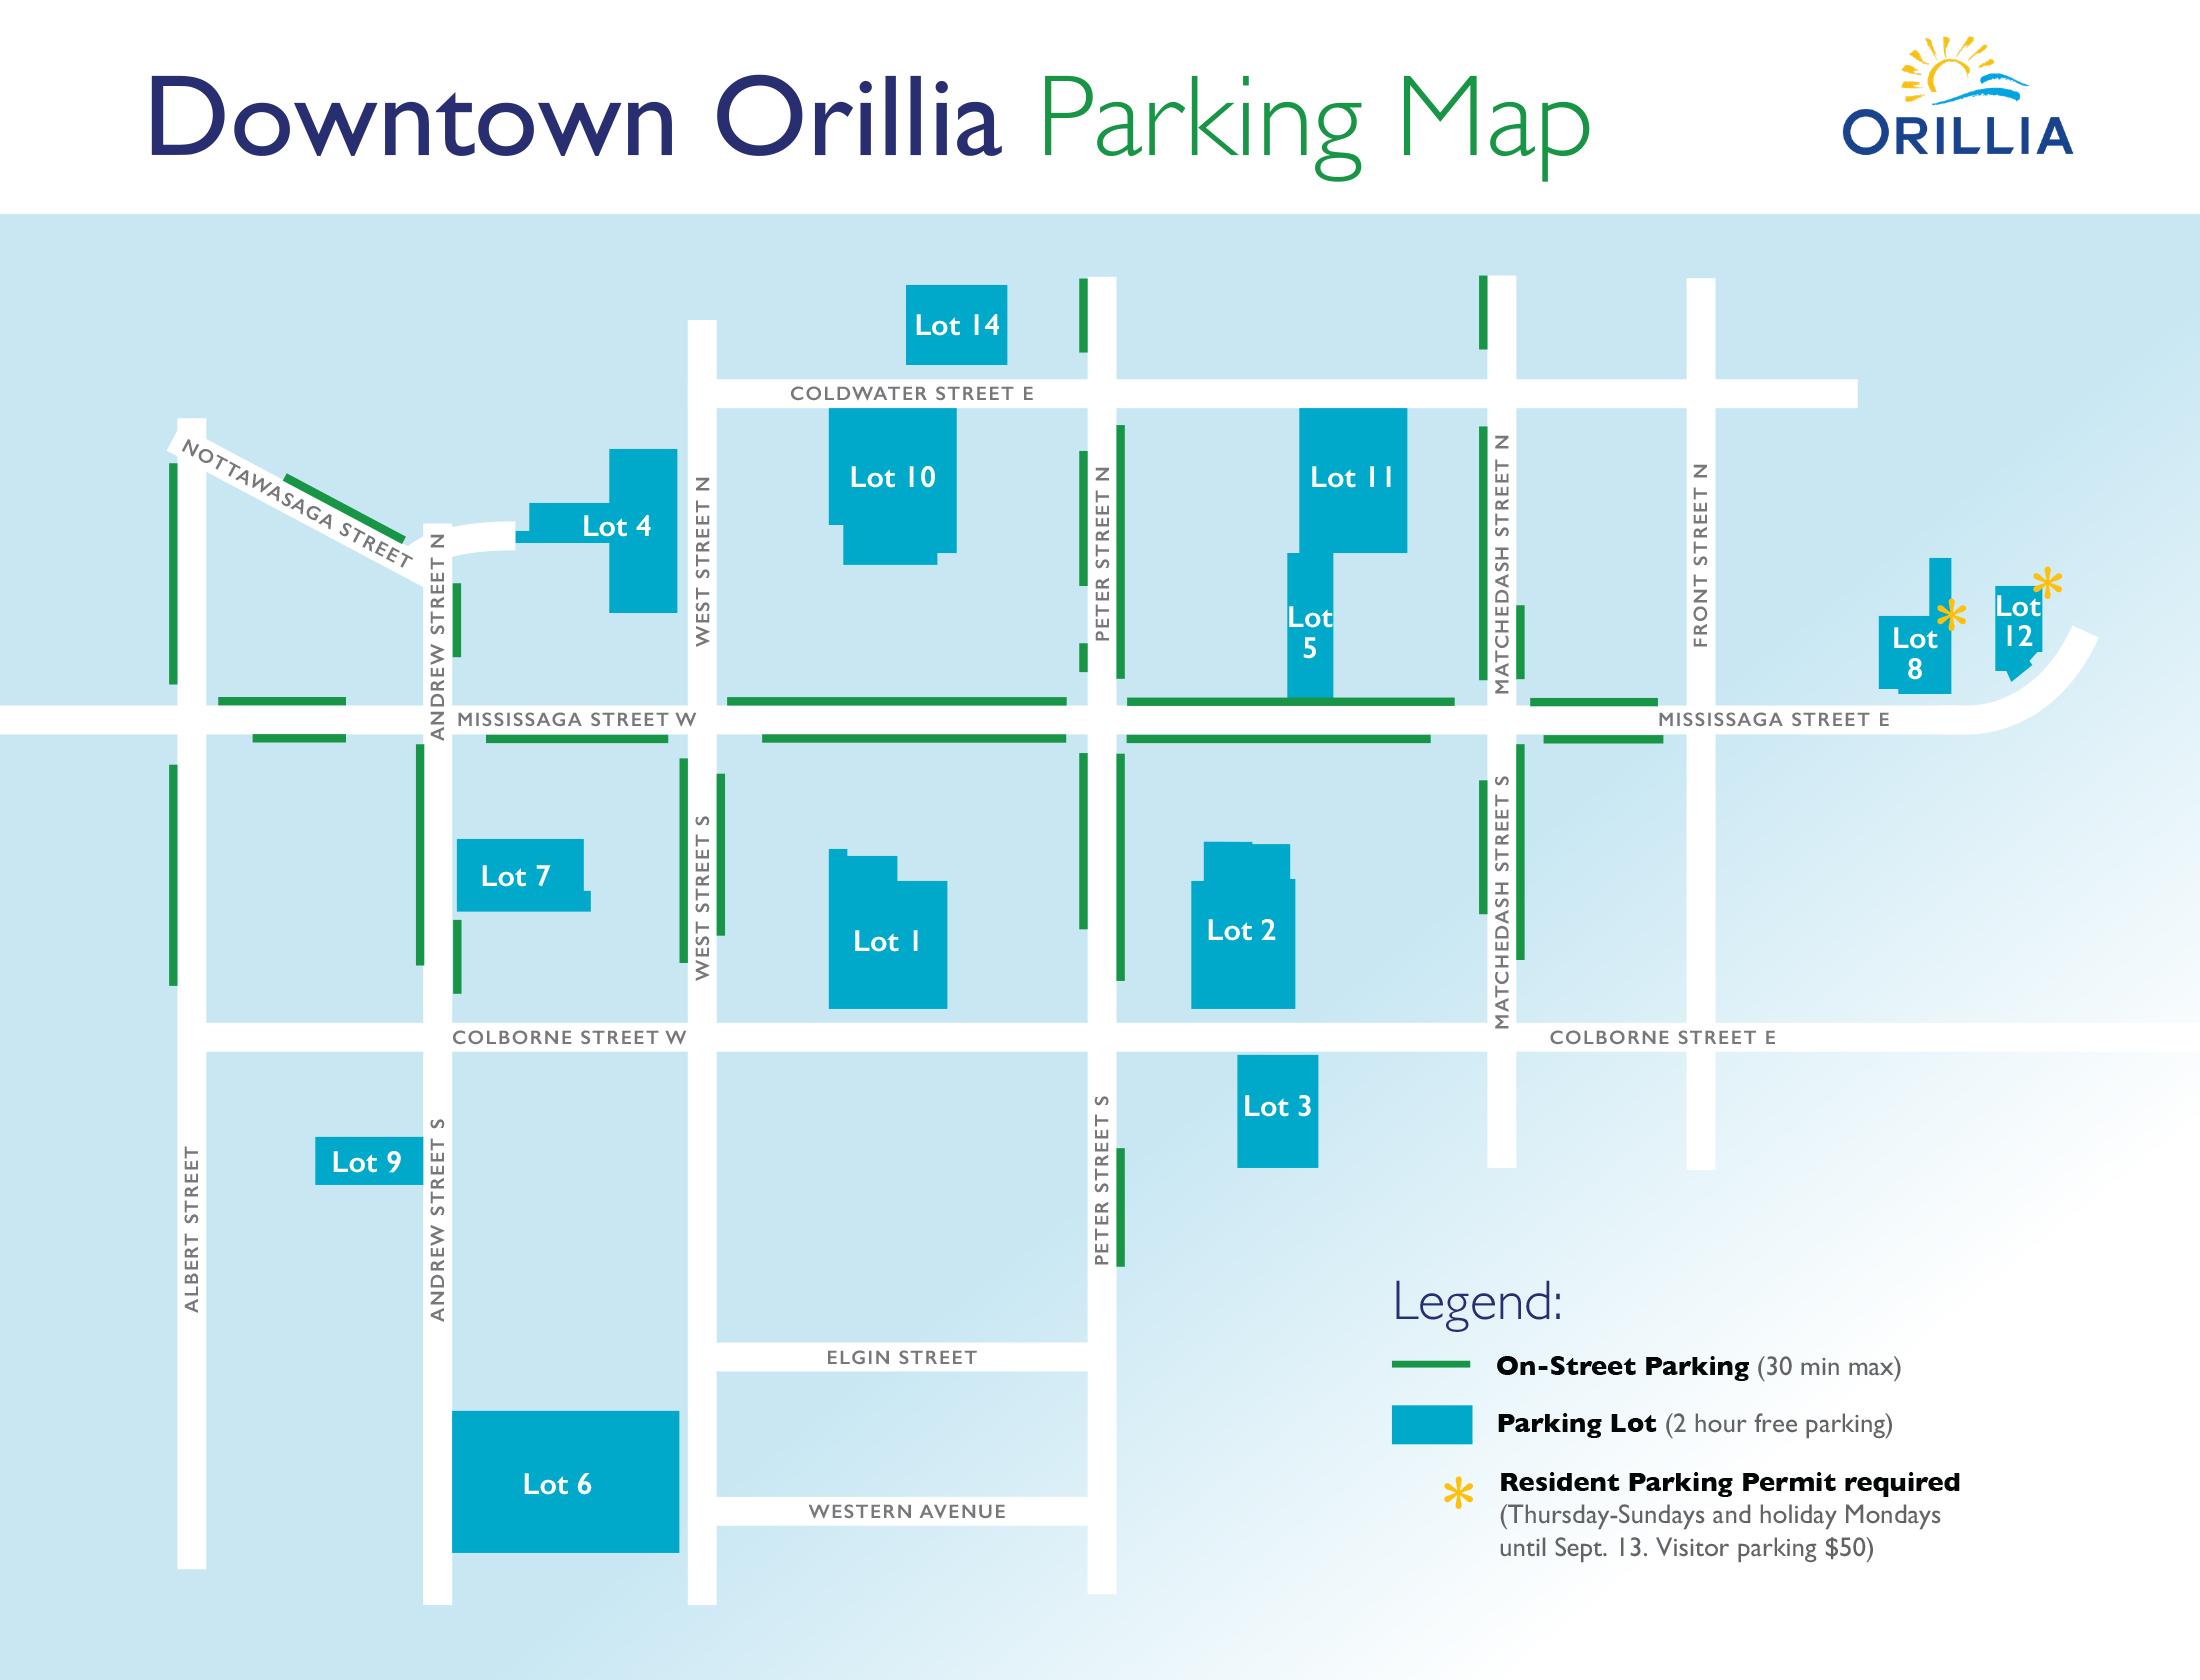 Downtown Orillia Parking Map